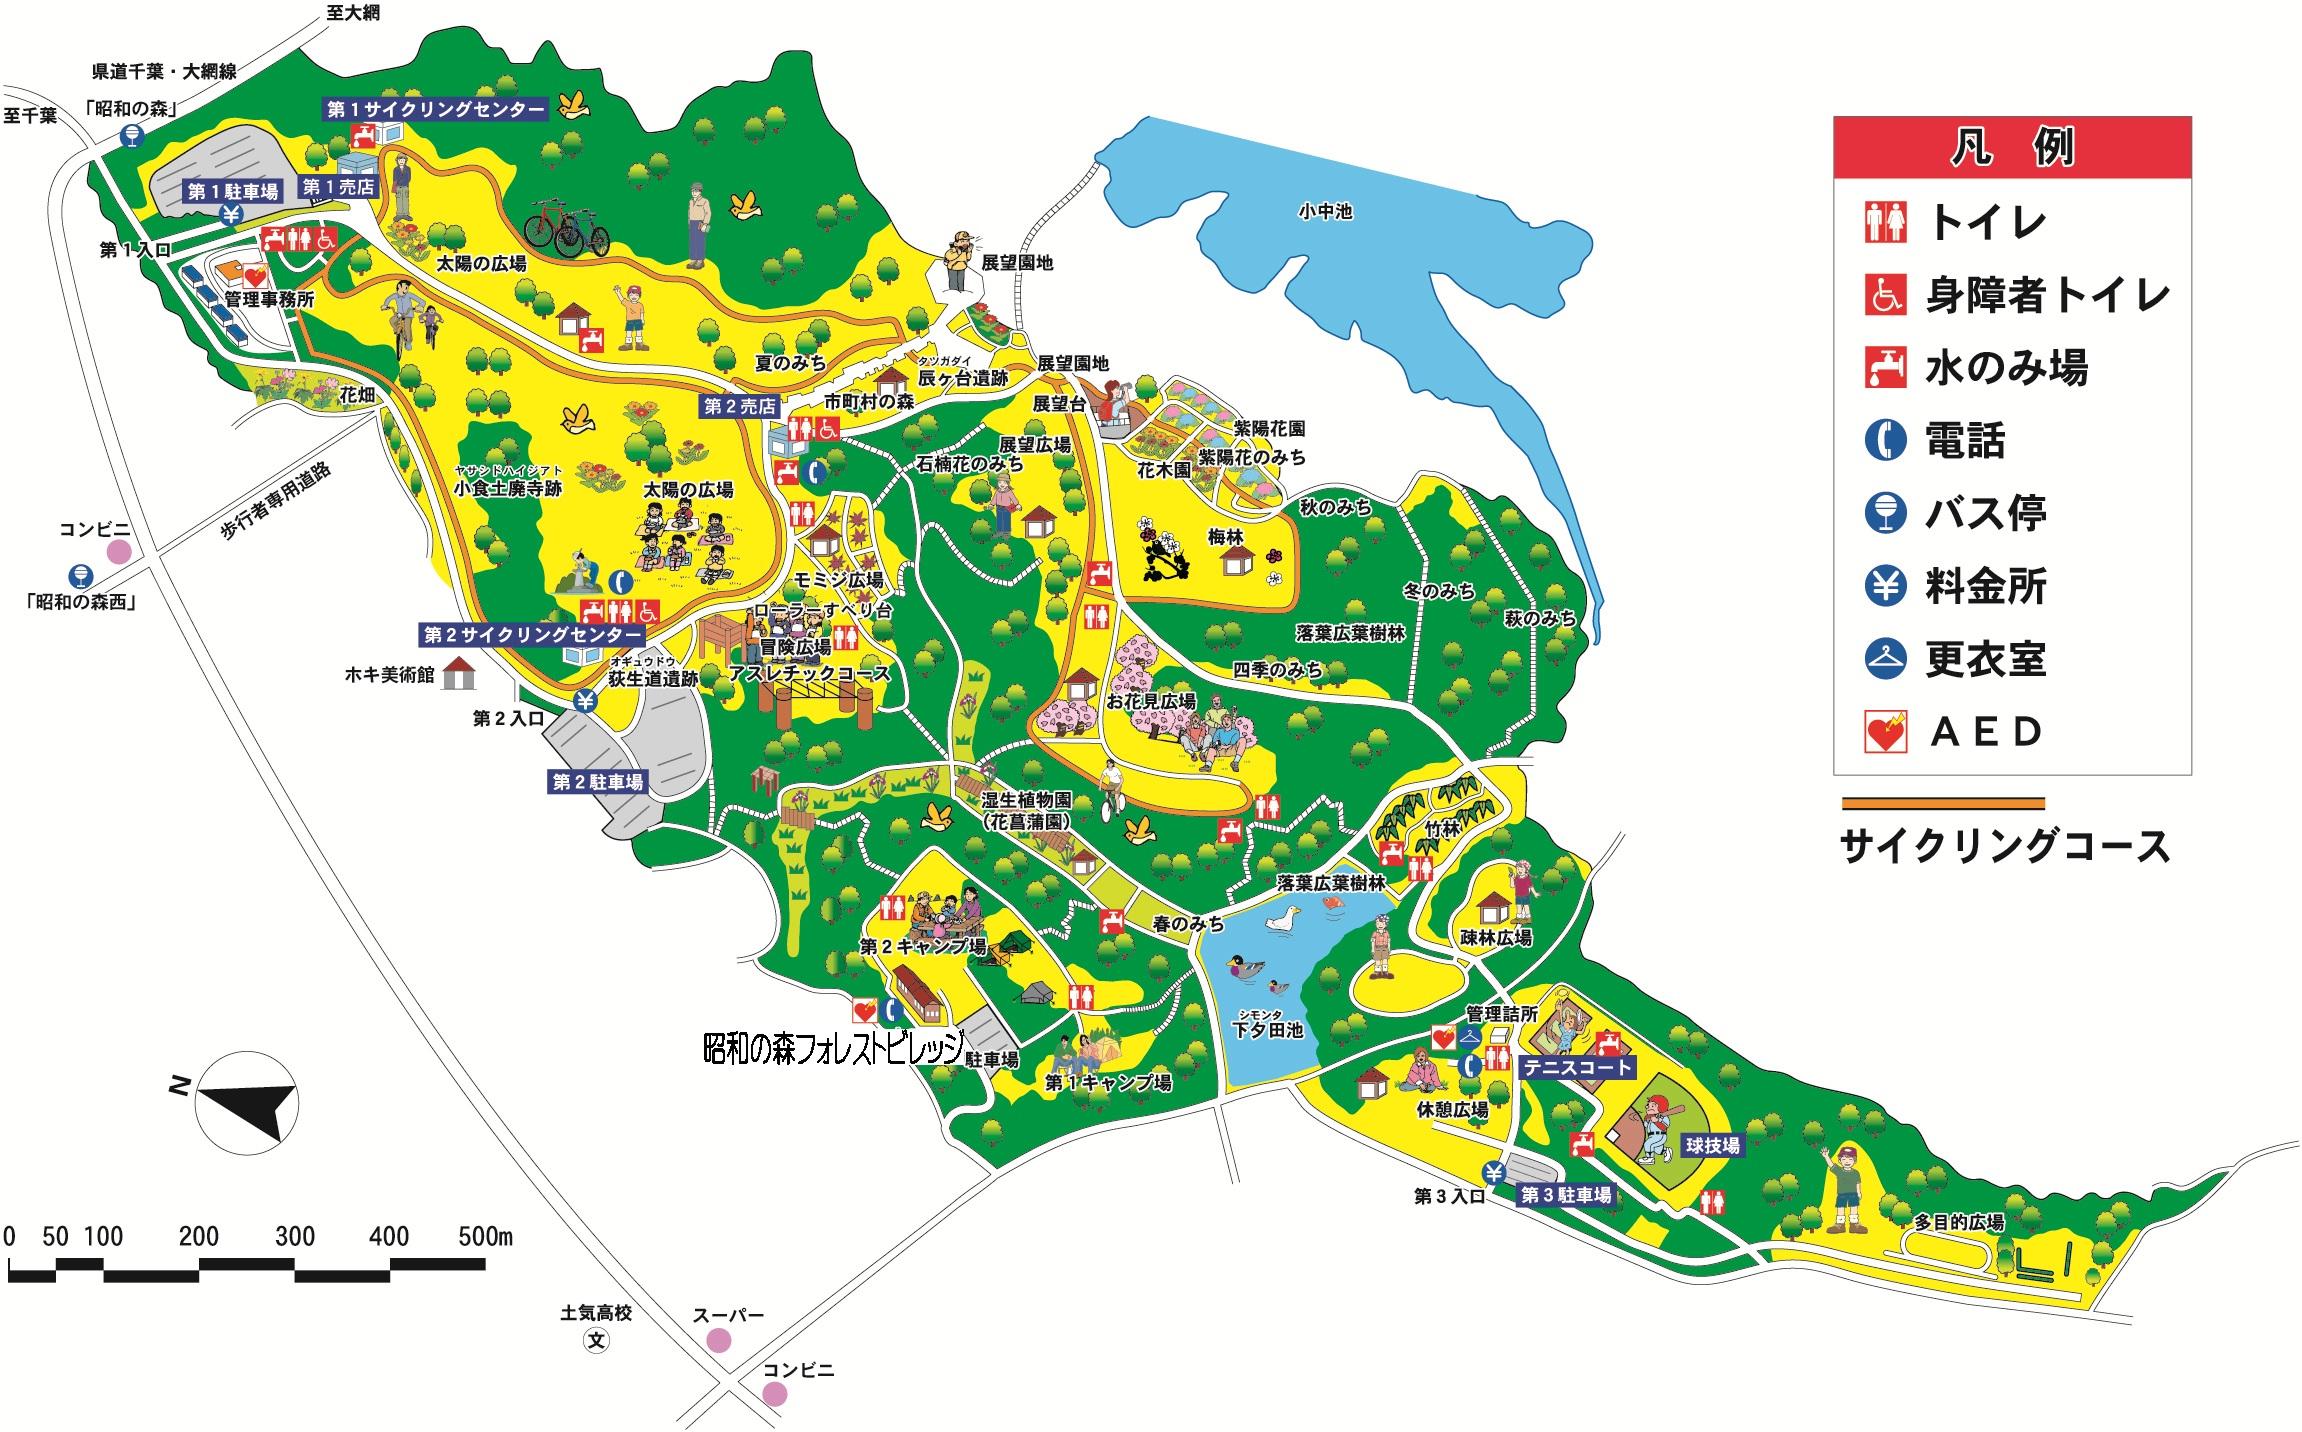 https://www.city.chiba.jp/toshi/koenryokuchi/kanri/midori/documents/map141013-6.jpg